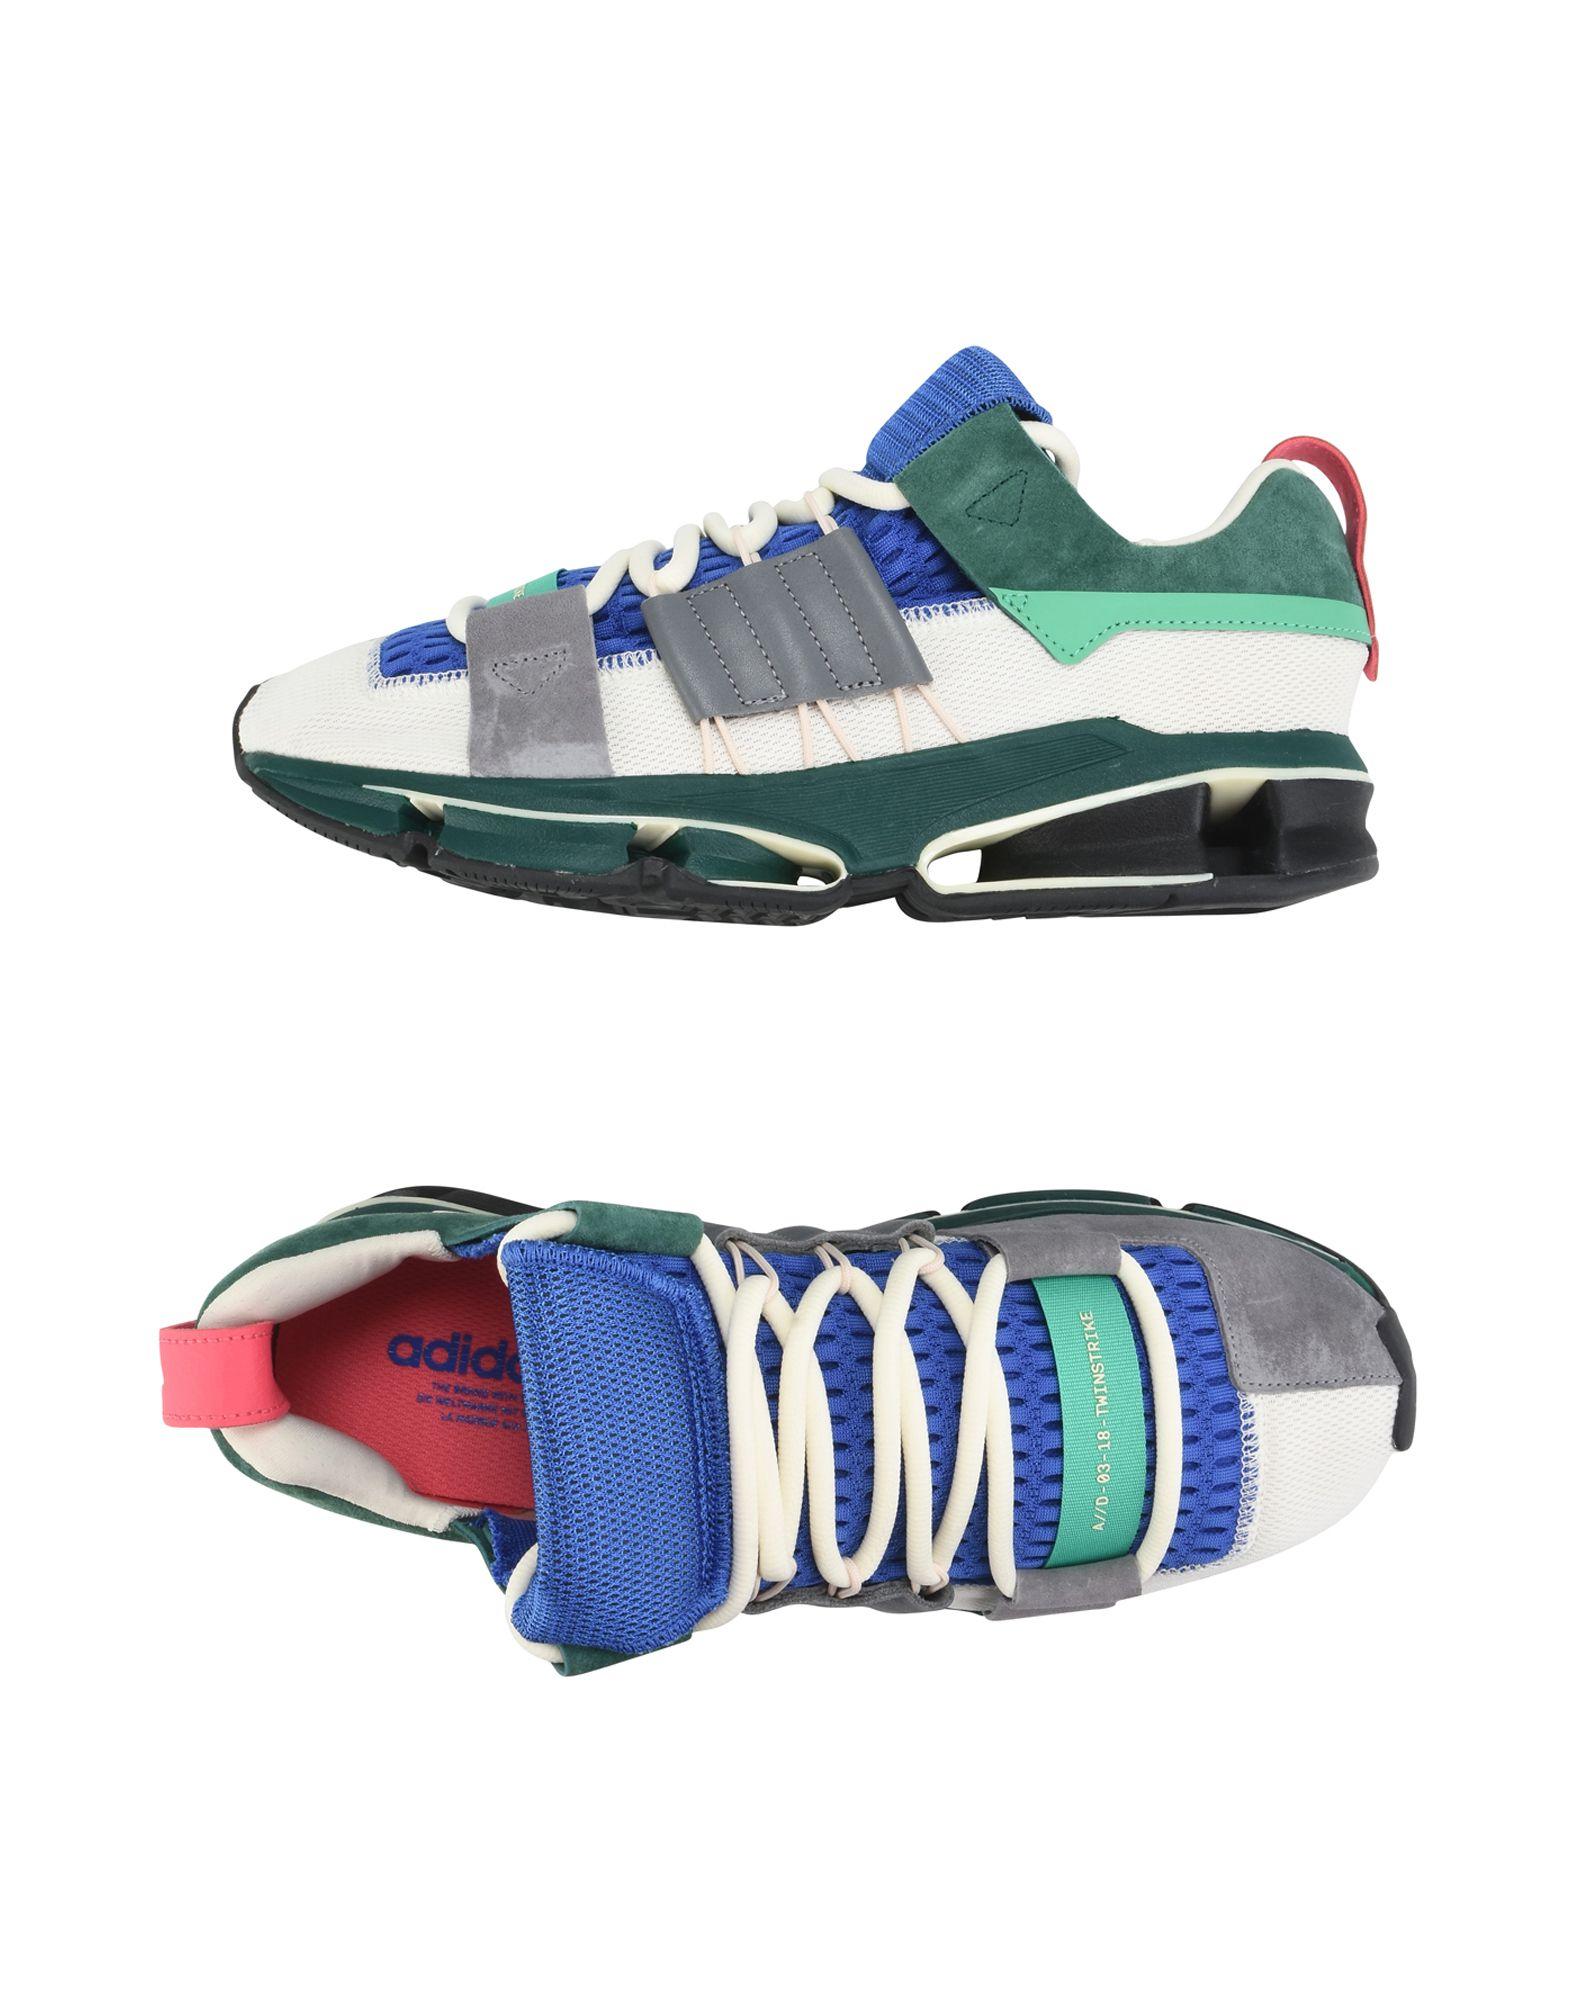 Sneakers Adidas Originals Twinstrike Adv - Uomo - Acquista online su